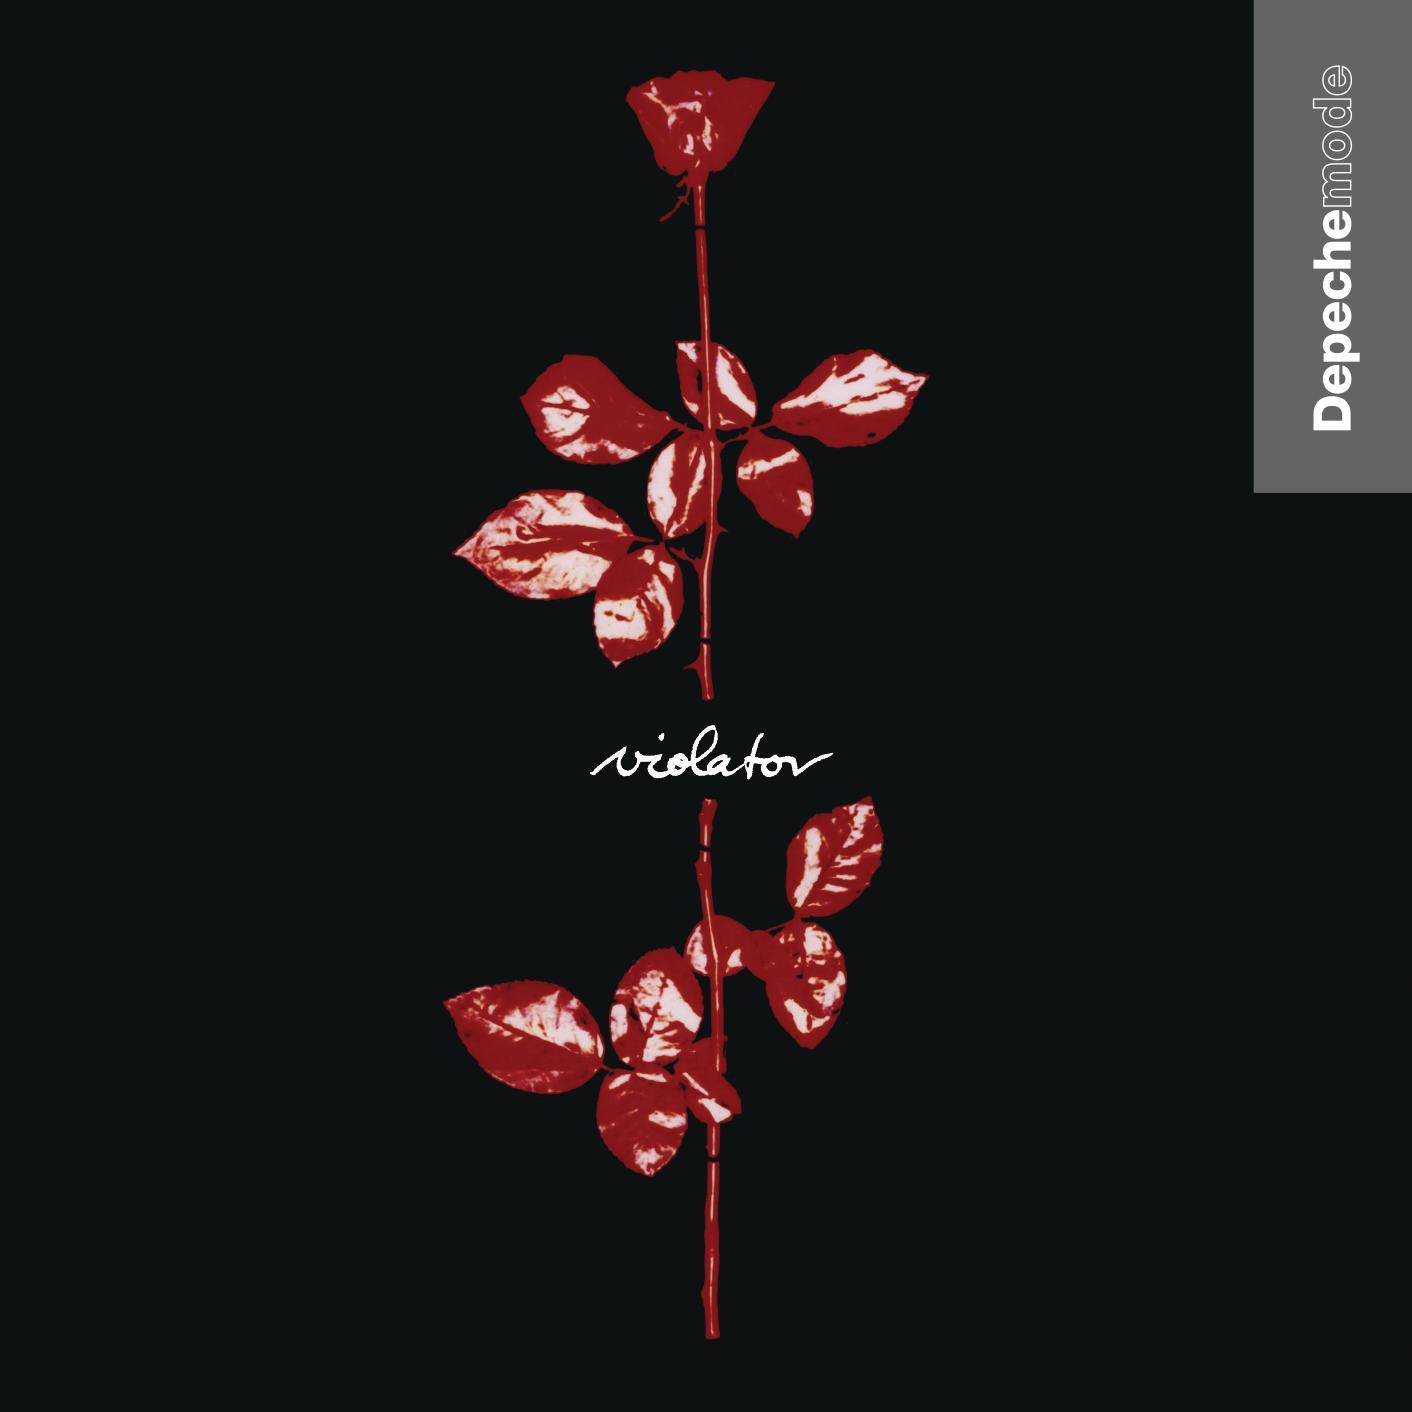 Violator. : Depeche Mode: Amazon.es: Música